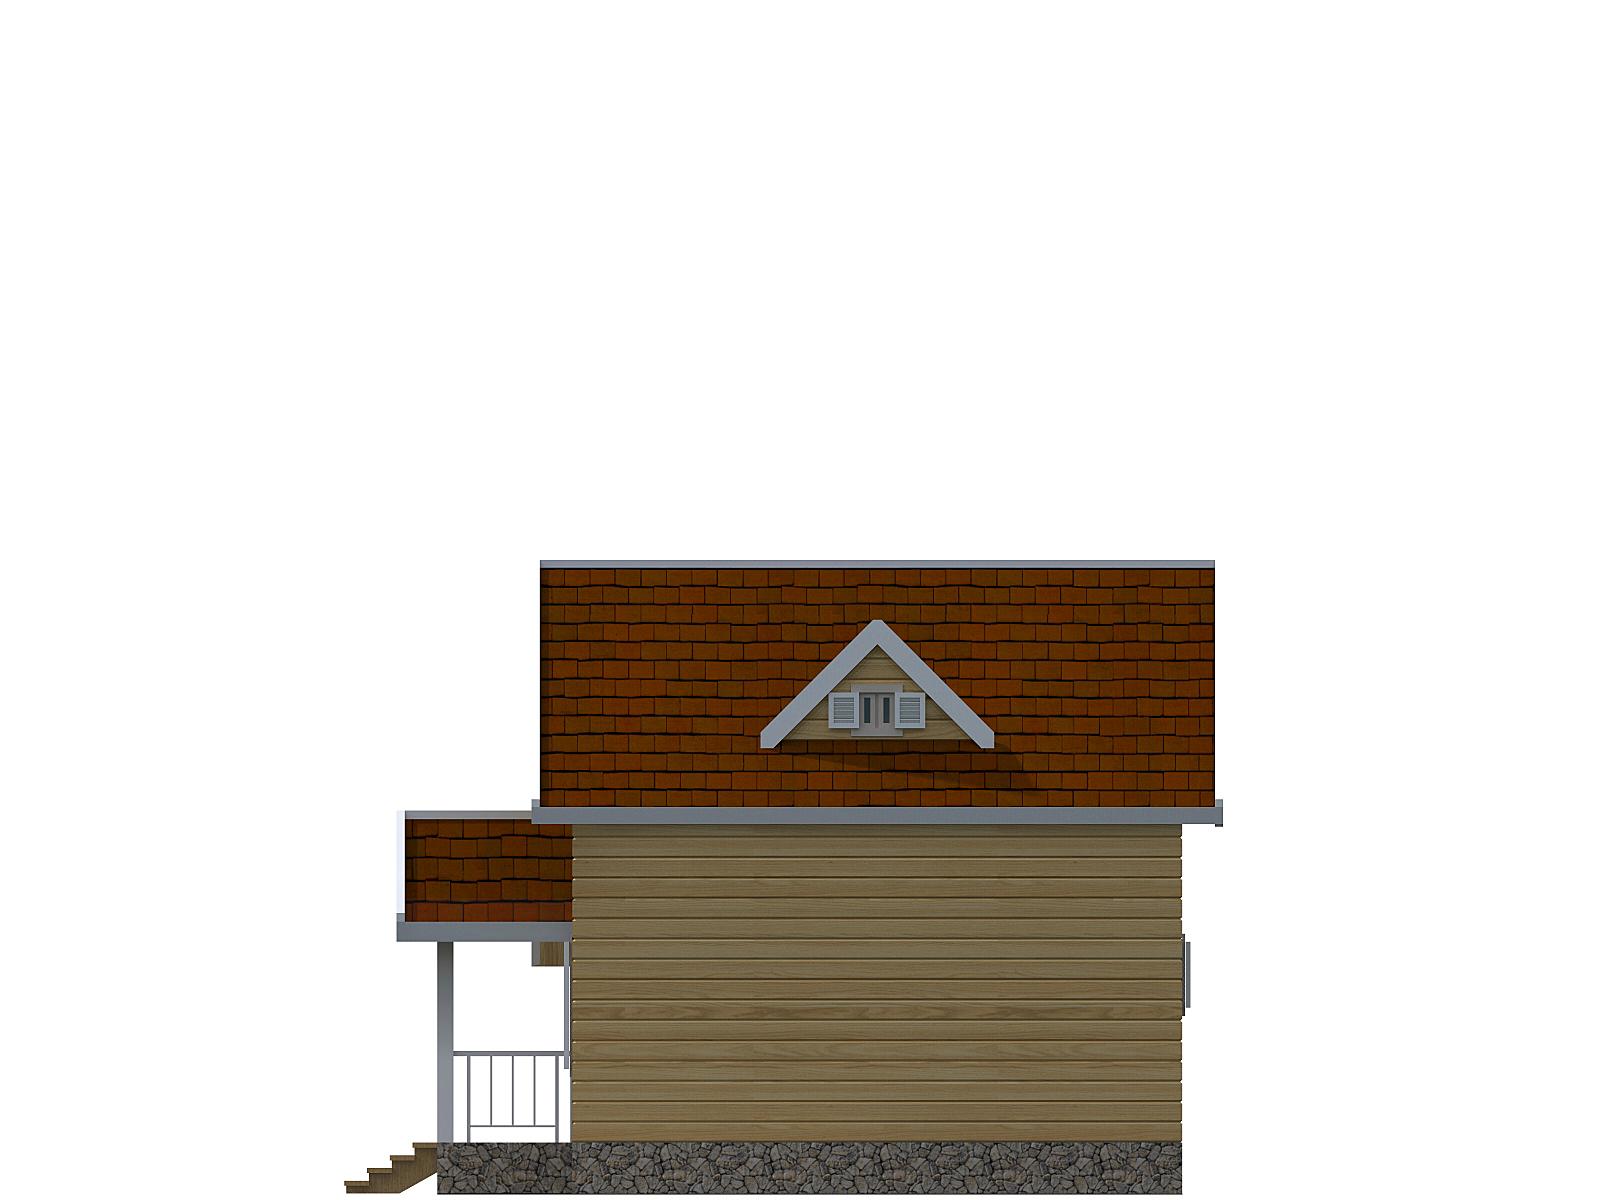 banya-iz-brusa-6x8-1.5-etazha-s-mansardoi-razrez3